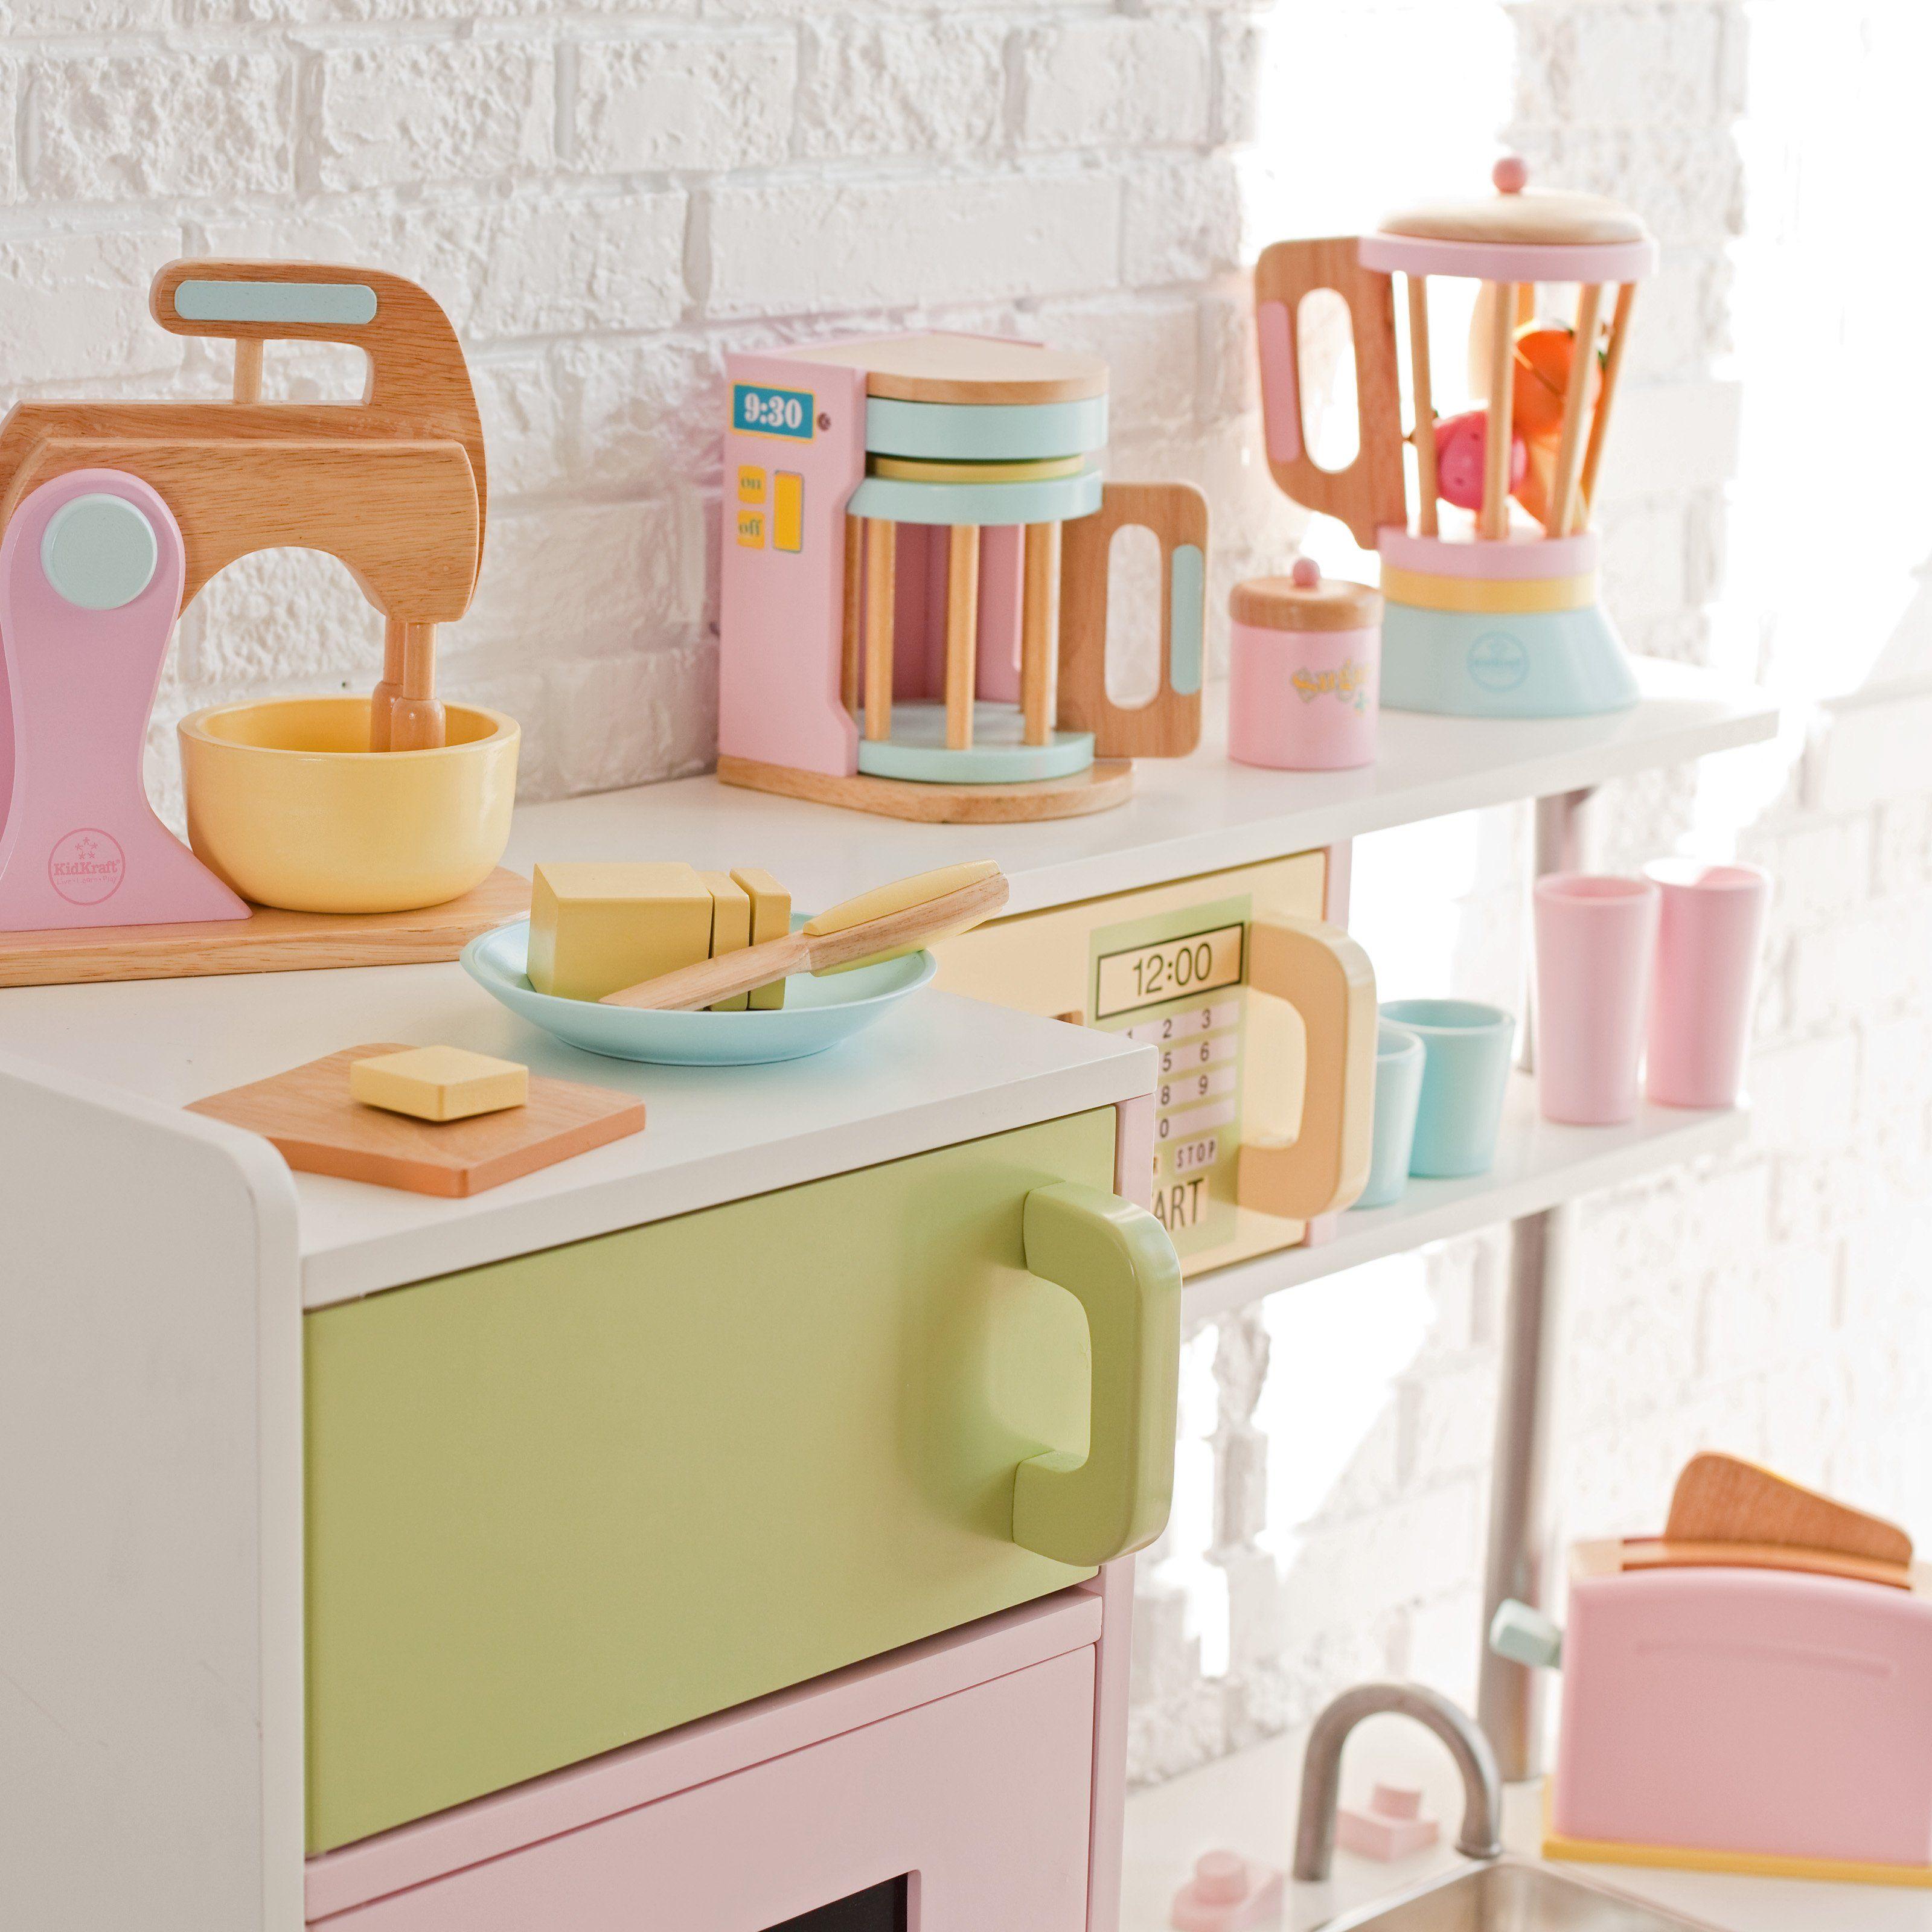 DIY Play Kitchen Diy play kitchen, Diy kids kitchen